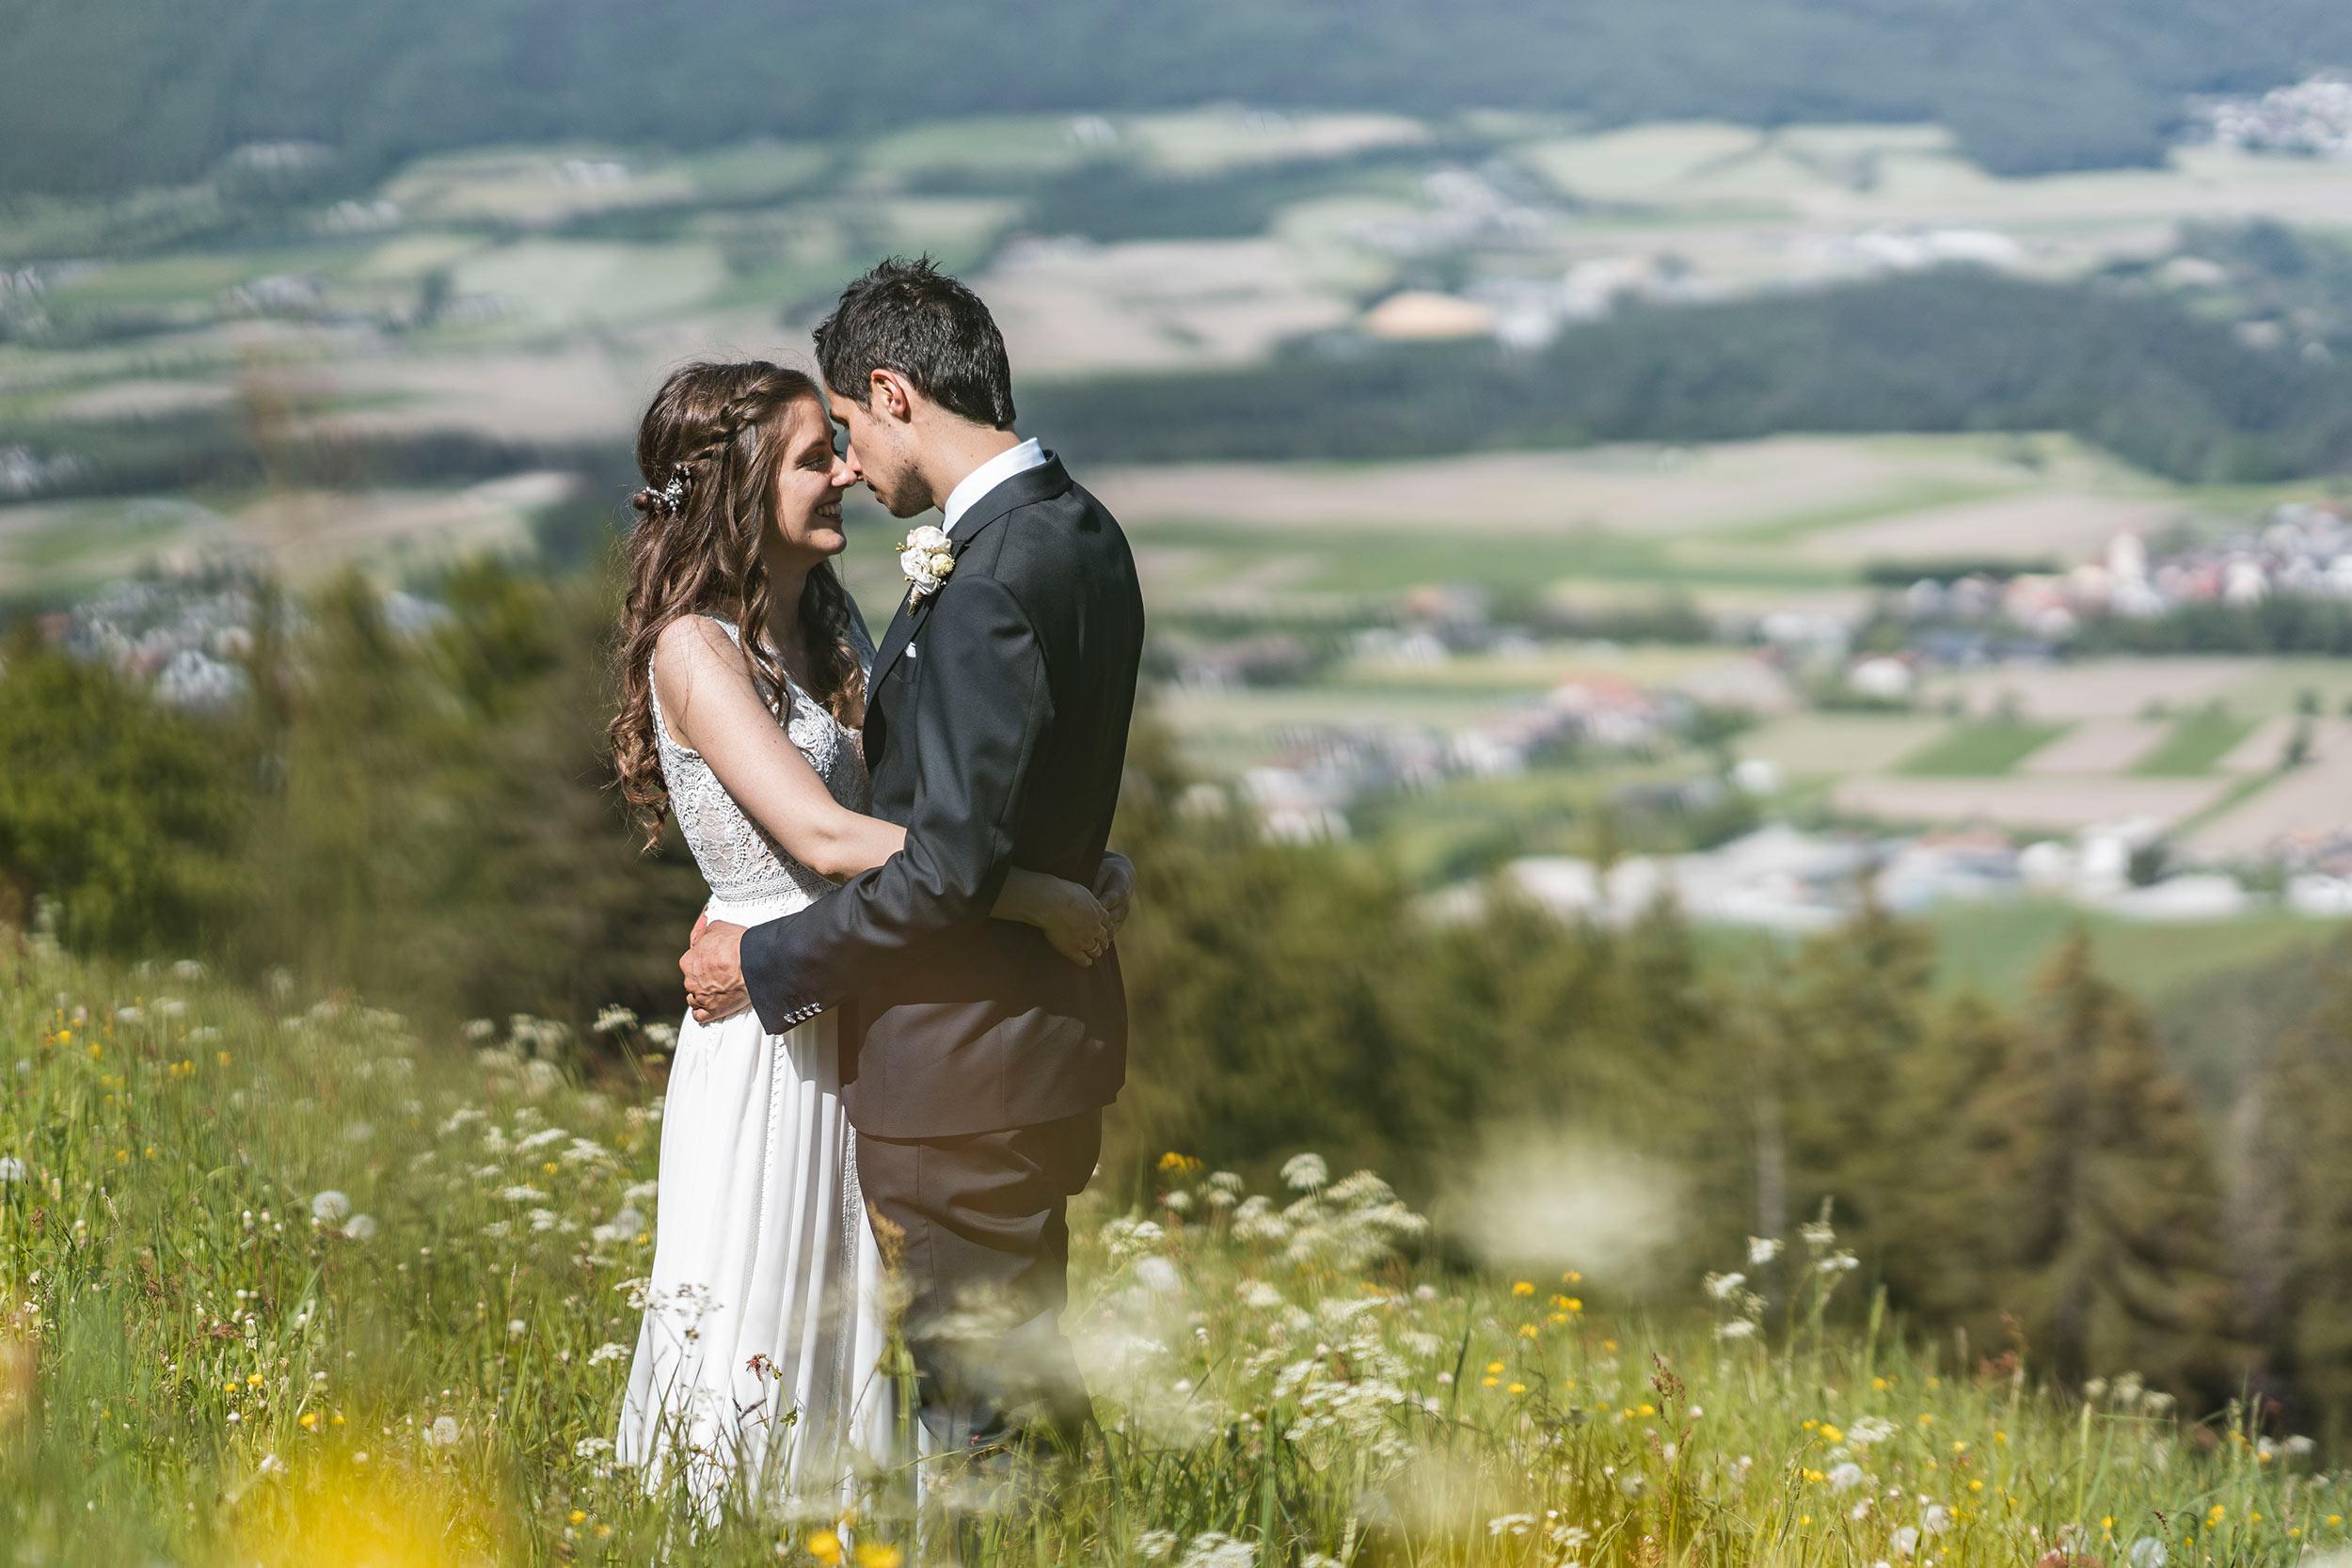 Evi_&_Christian_Hochzeit_01-06-2019_398